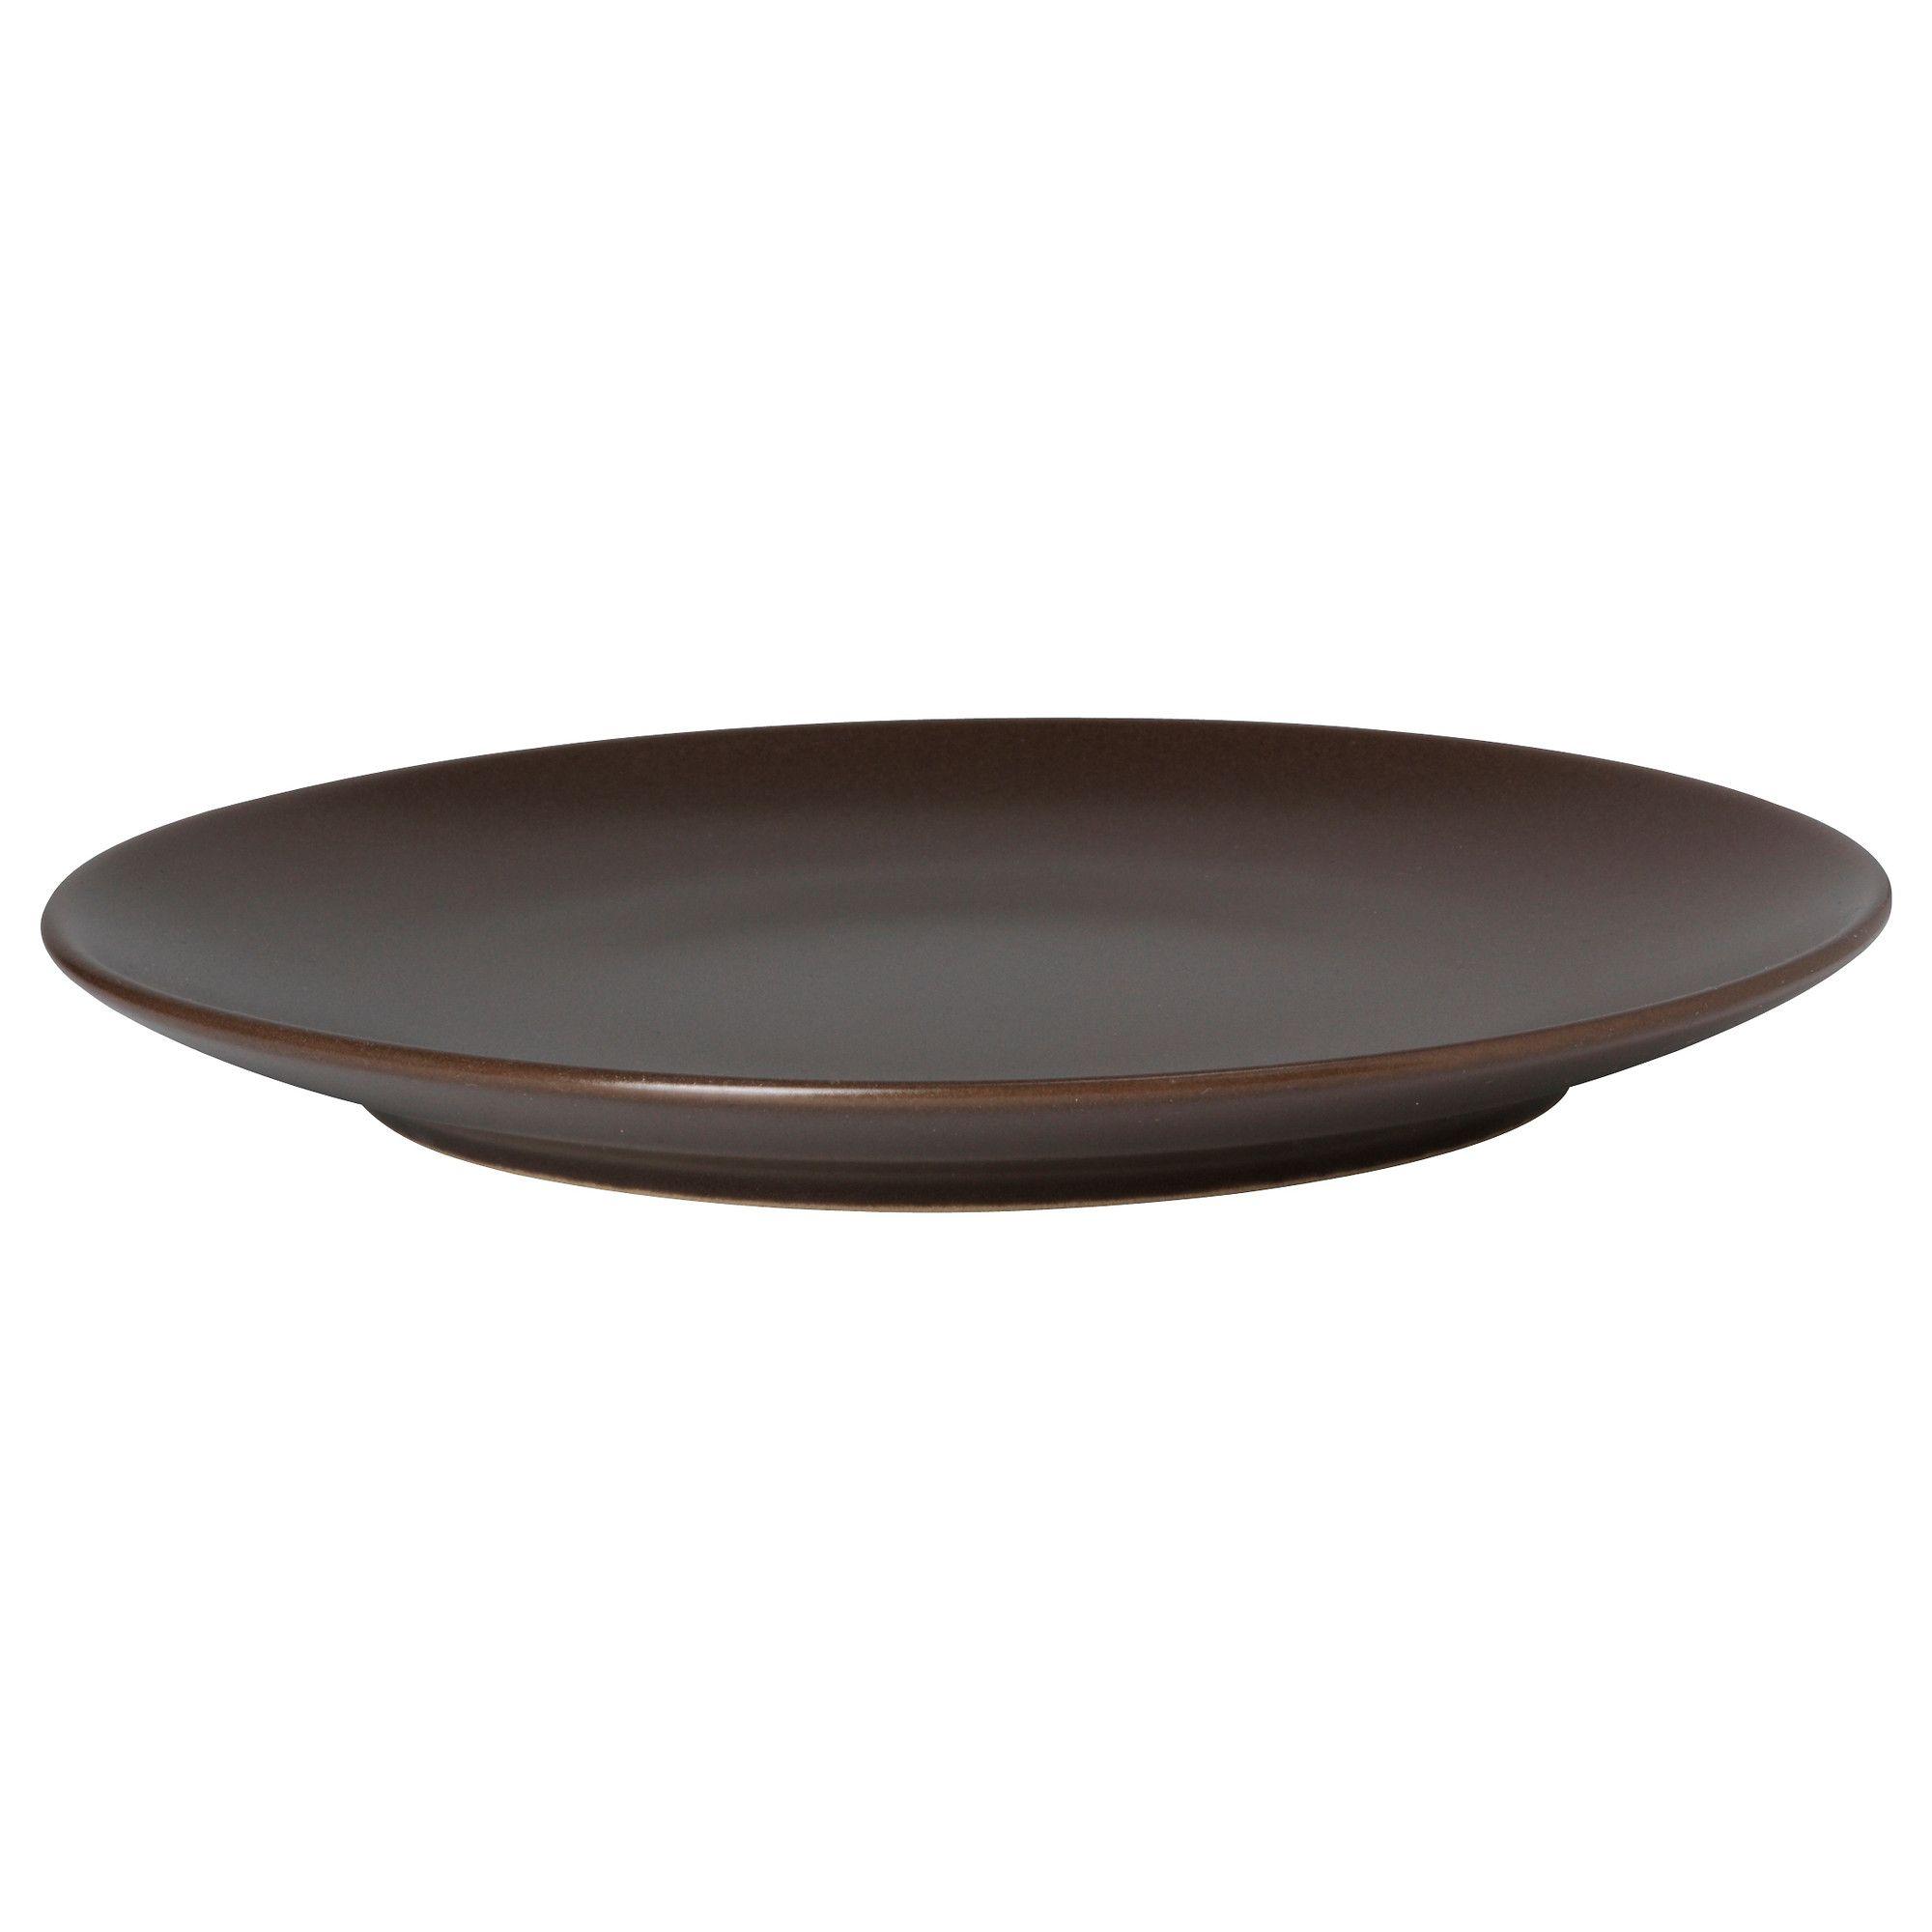 DINERA Side plate - IKEA $9.99/4 ct  sc 1 st  Pinterest & DINERA Side plate - IKEA $9.99/4 ct   PCS   Pinterest   Side plates ...